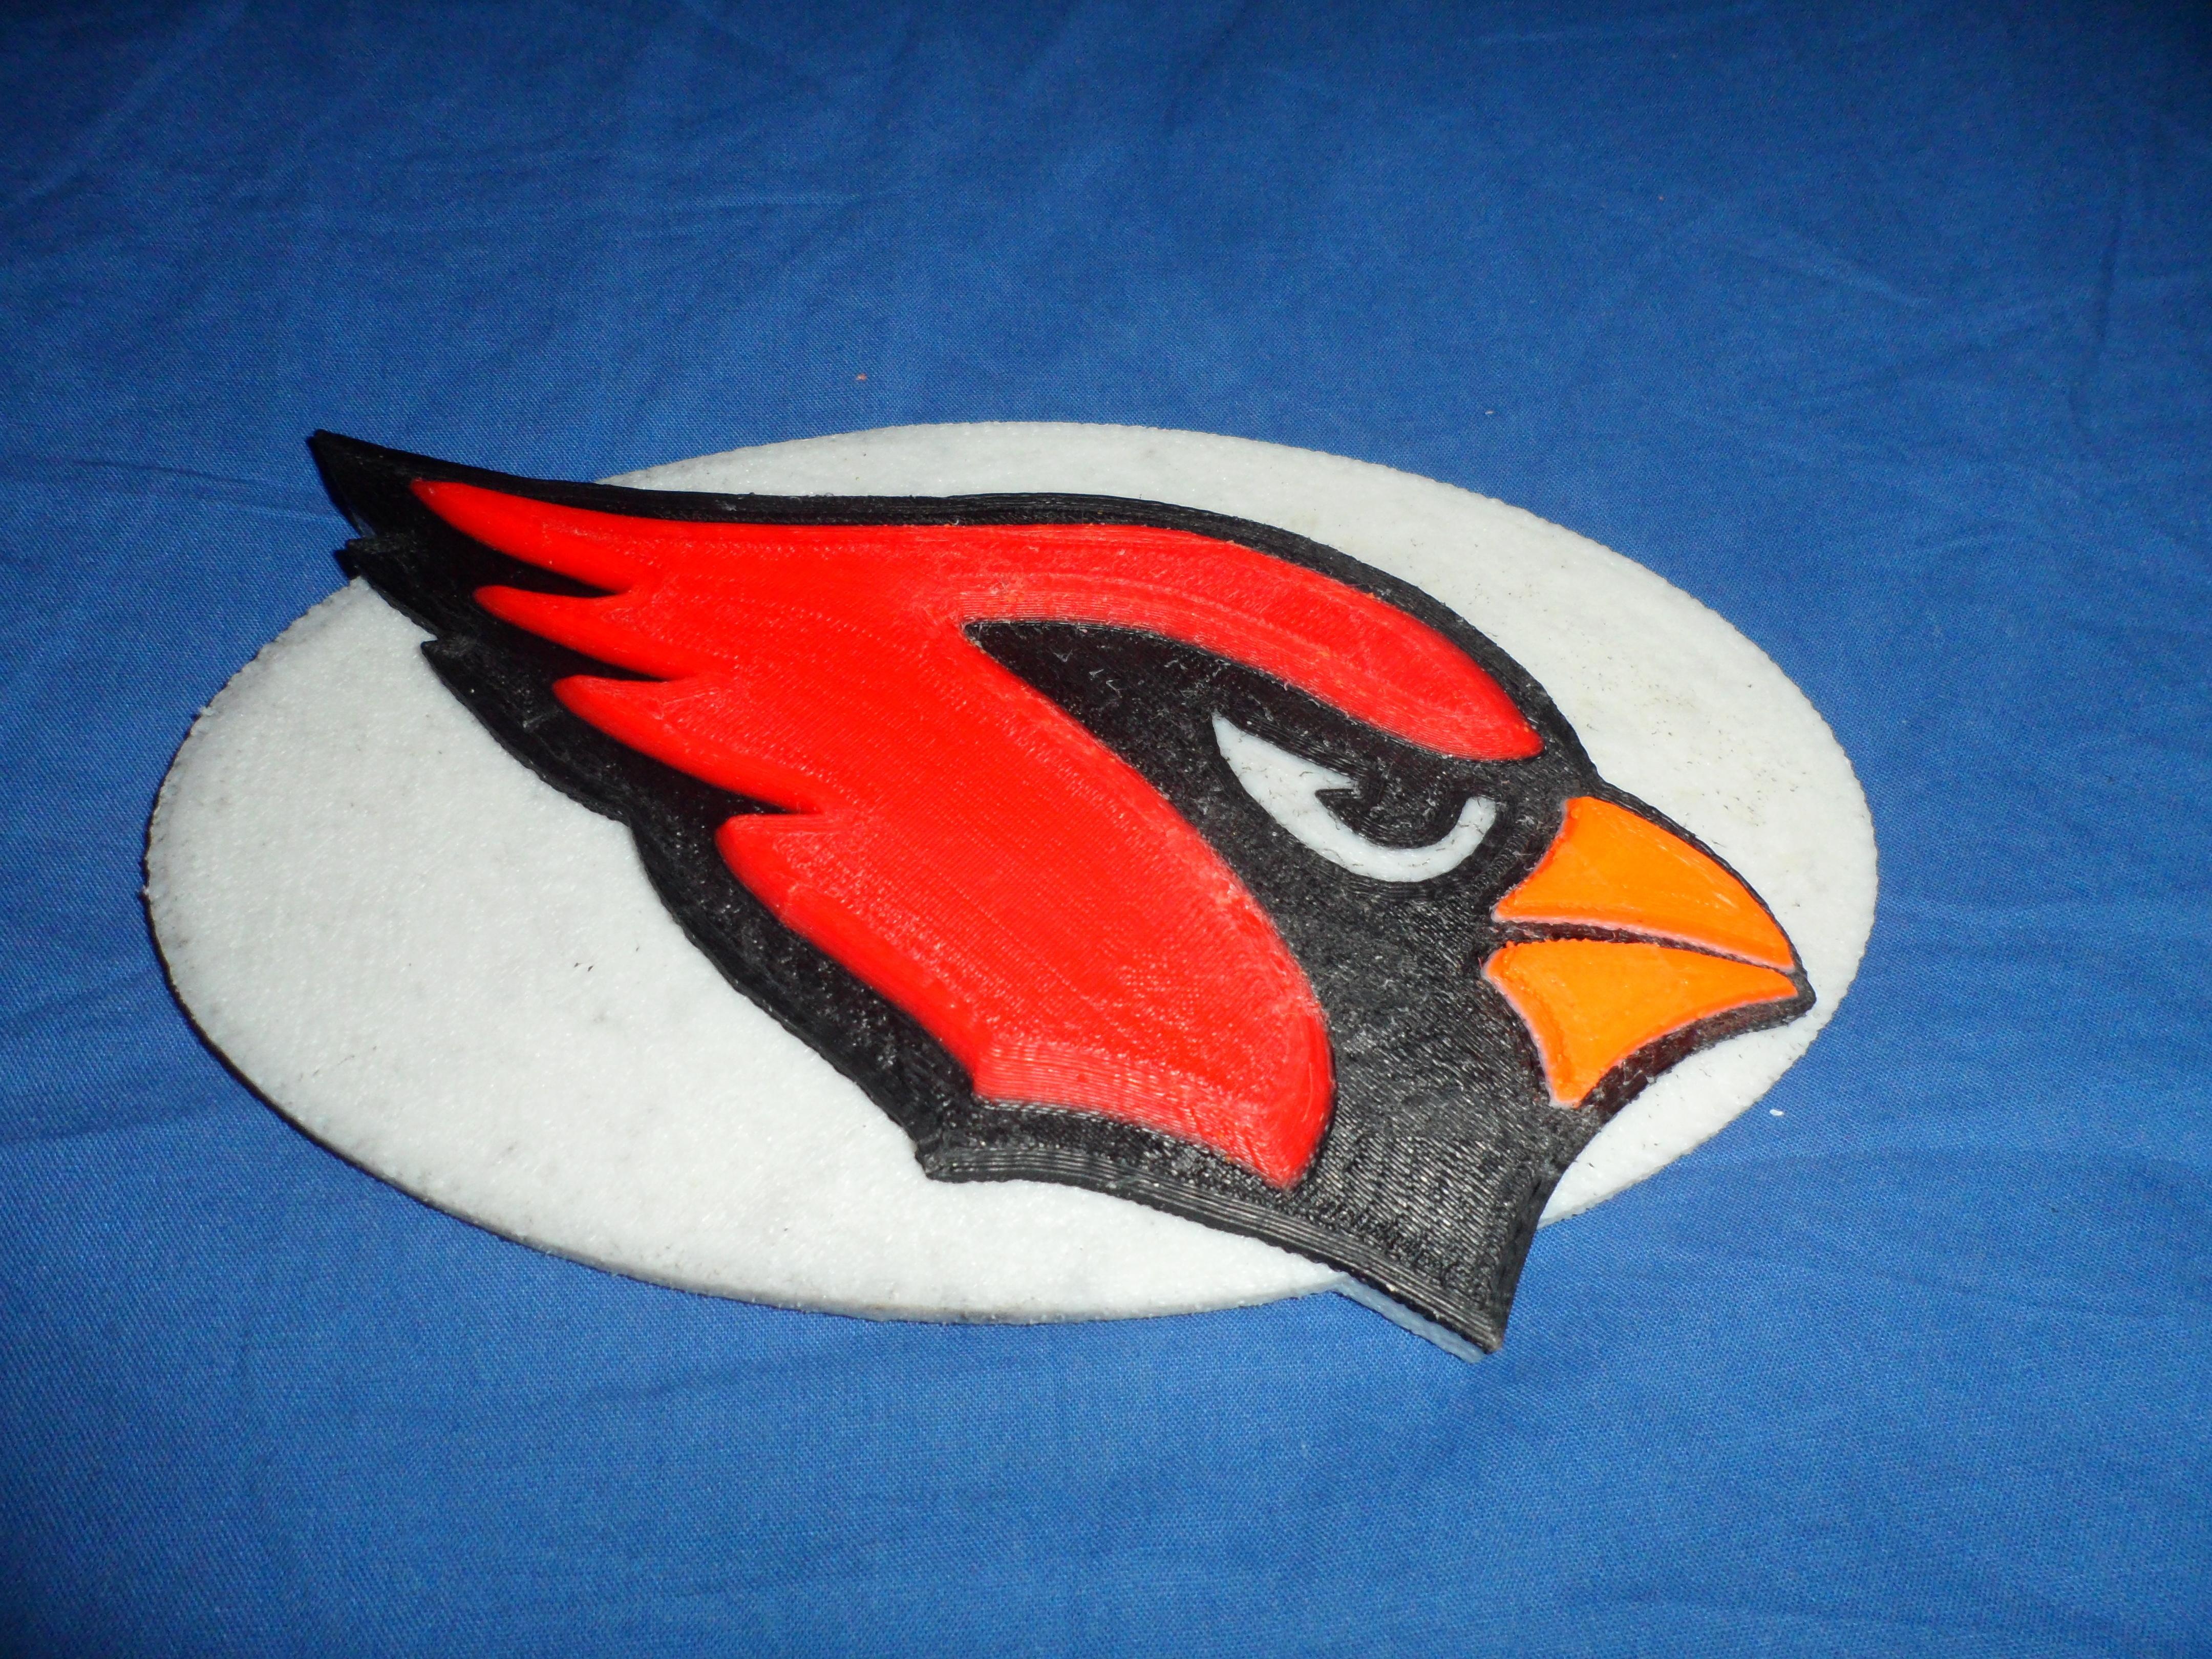 ce43e77911d 3D Printed Cardinals football logo by rds2 | Pinshape